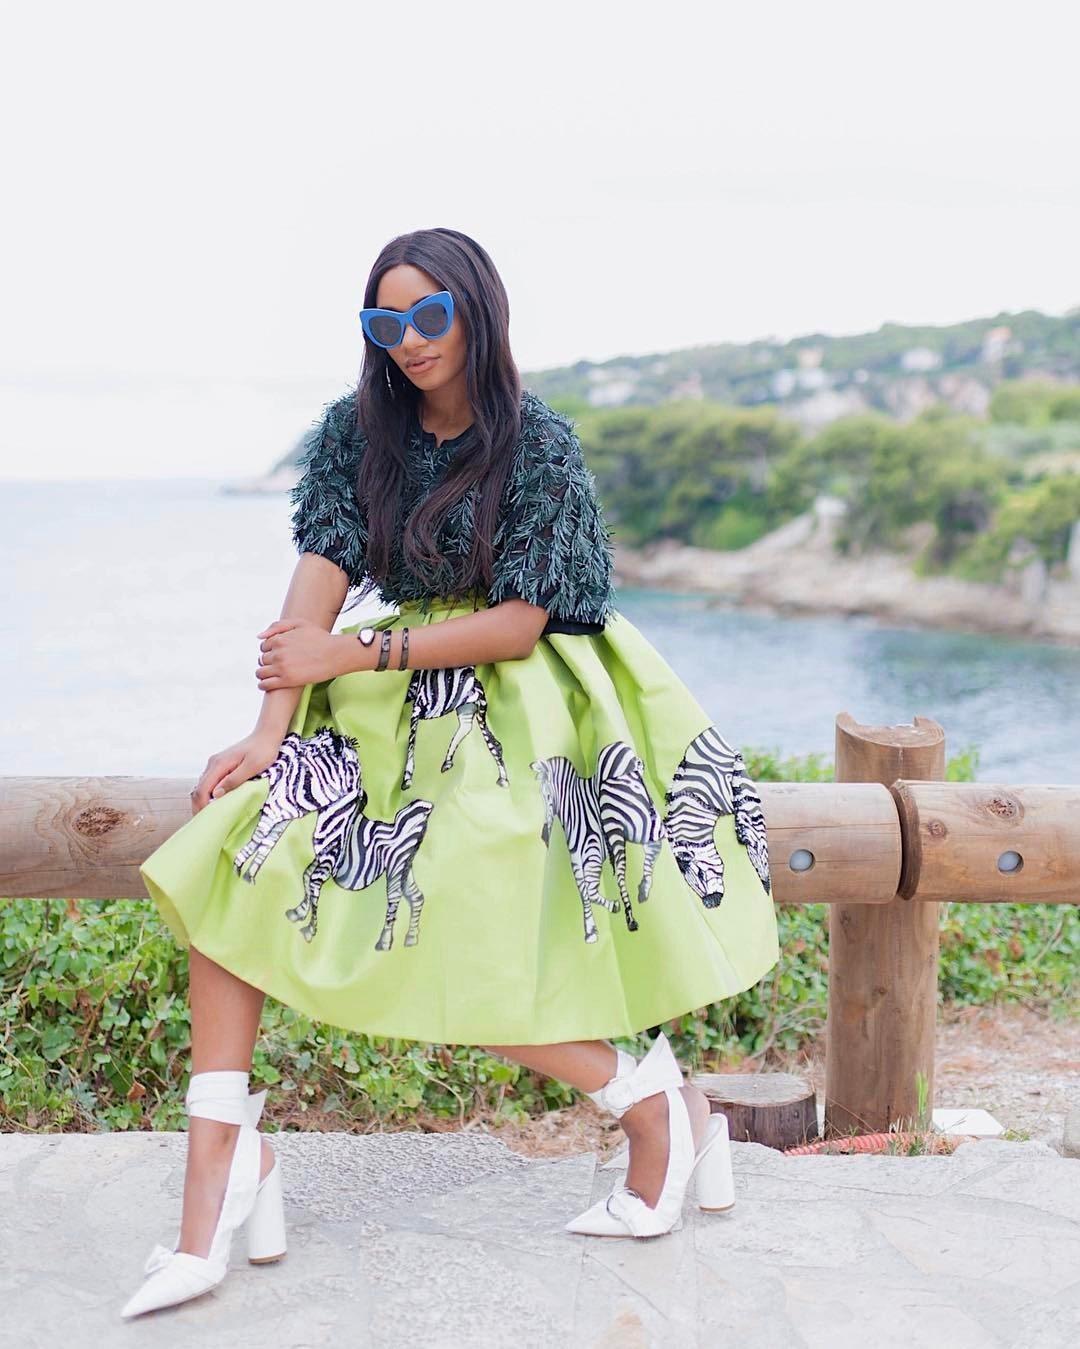 omotola-tiwa-savage-toke-makinwa-bonang-matheba-show-us-17-ways-wear-green-fabulously-greenenvygoals